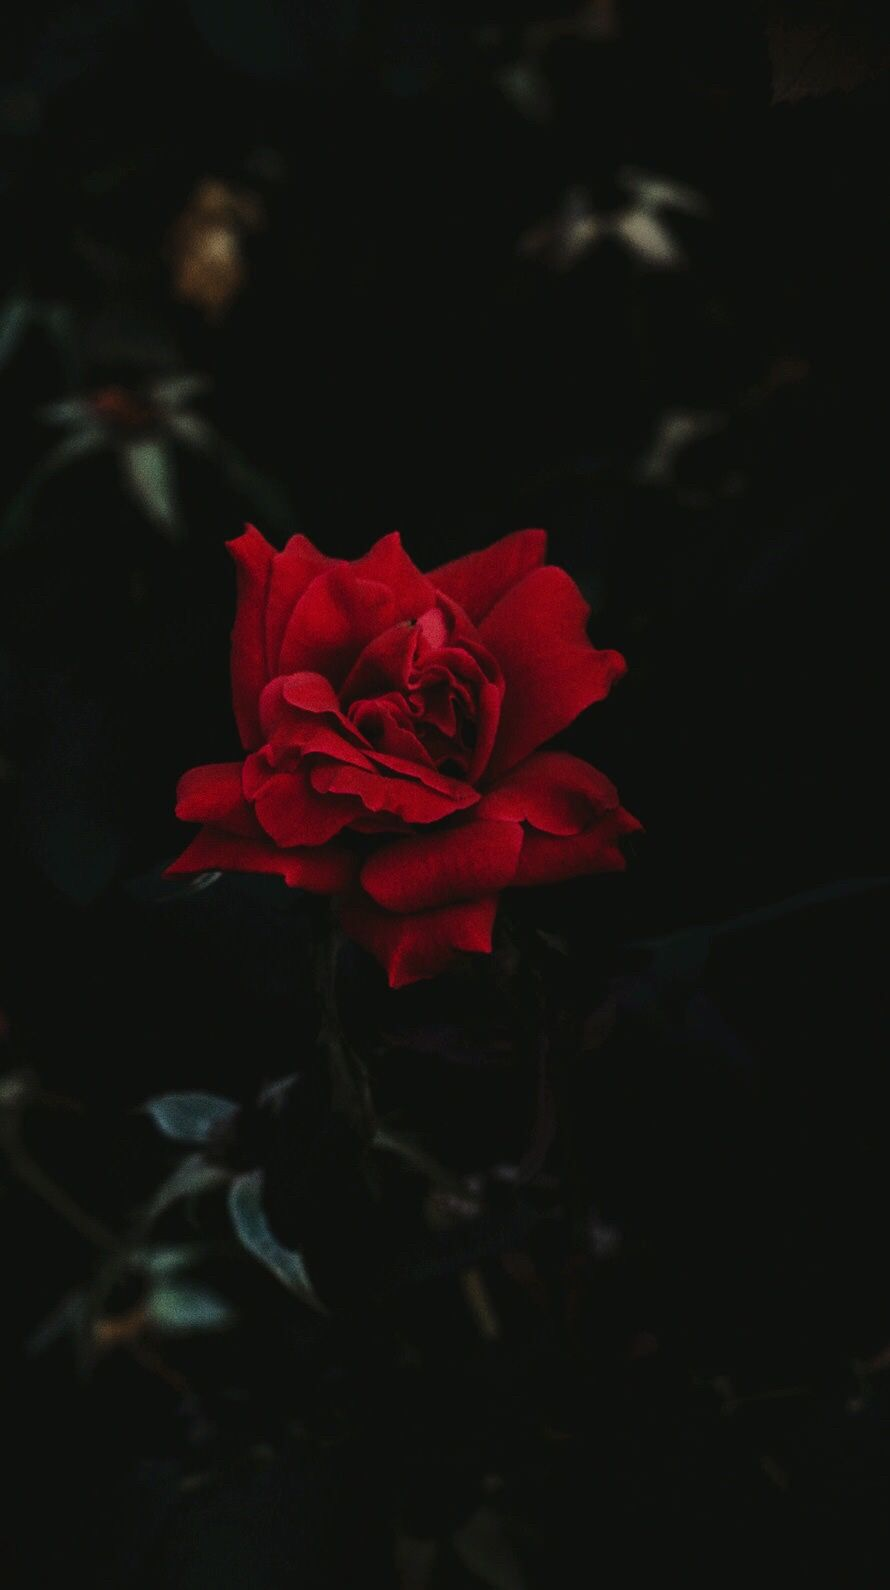 Pin Oleh Lovesick Rat Di Wallpapers Poster Bunga Lukisan Bunga Latar Belakang